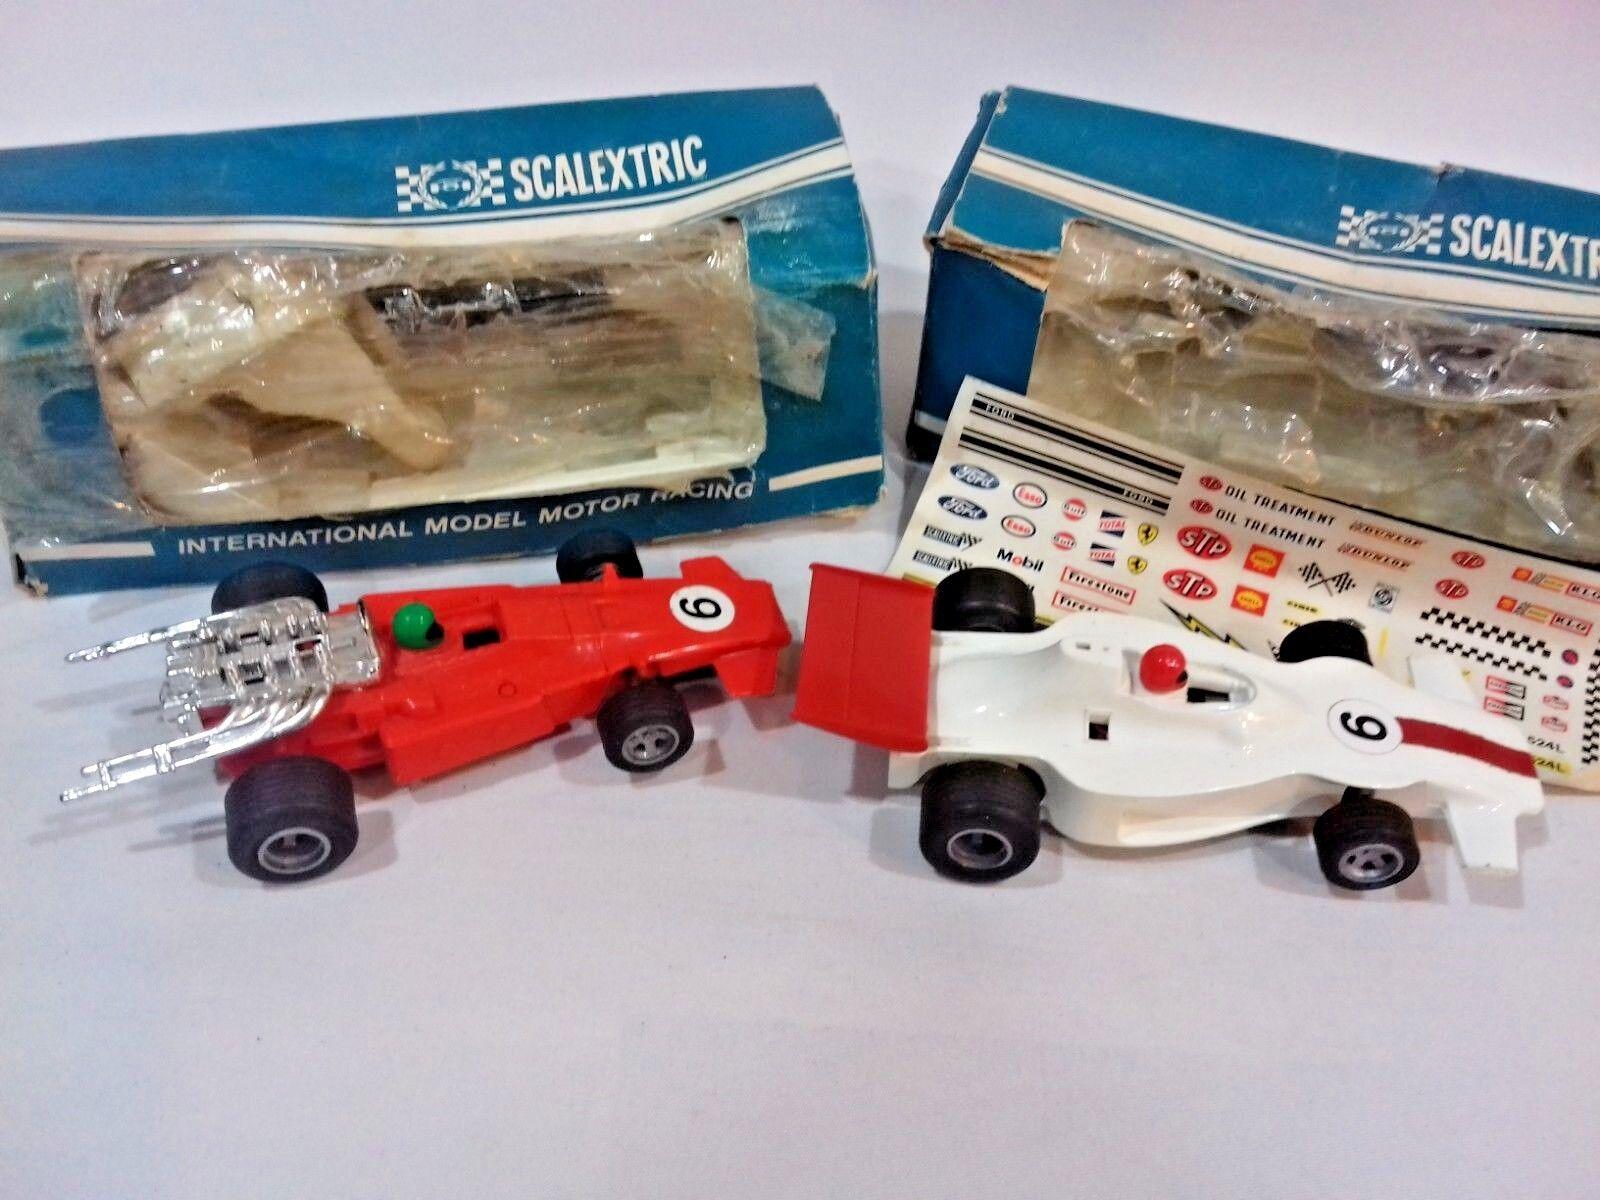 Scalextric voiture vintage F1 Flèche Rouge C023 & C012 Shadow & Feuille Autocollant Rovex Ltd